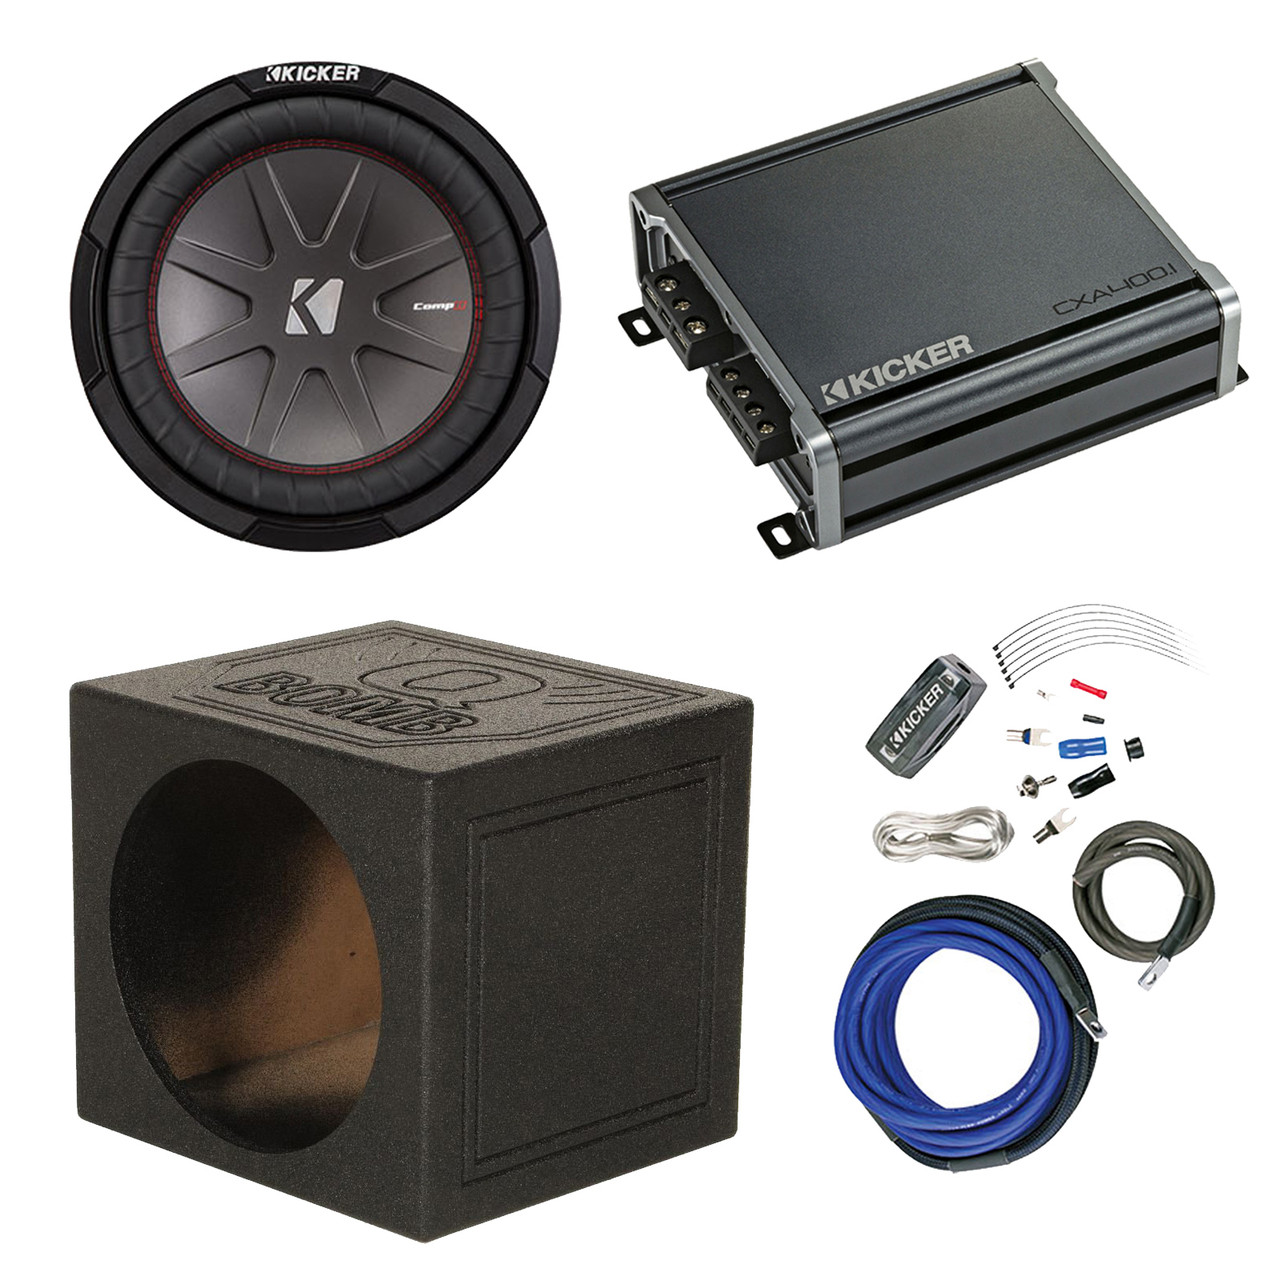 medium resolution of kicker 10 4 ohm car audio subwoofer 600 watt amp 10 sub box amp wiring kit r 43cwr104 1 43cxa3001 road entertainment